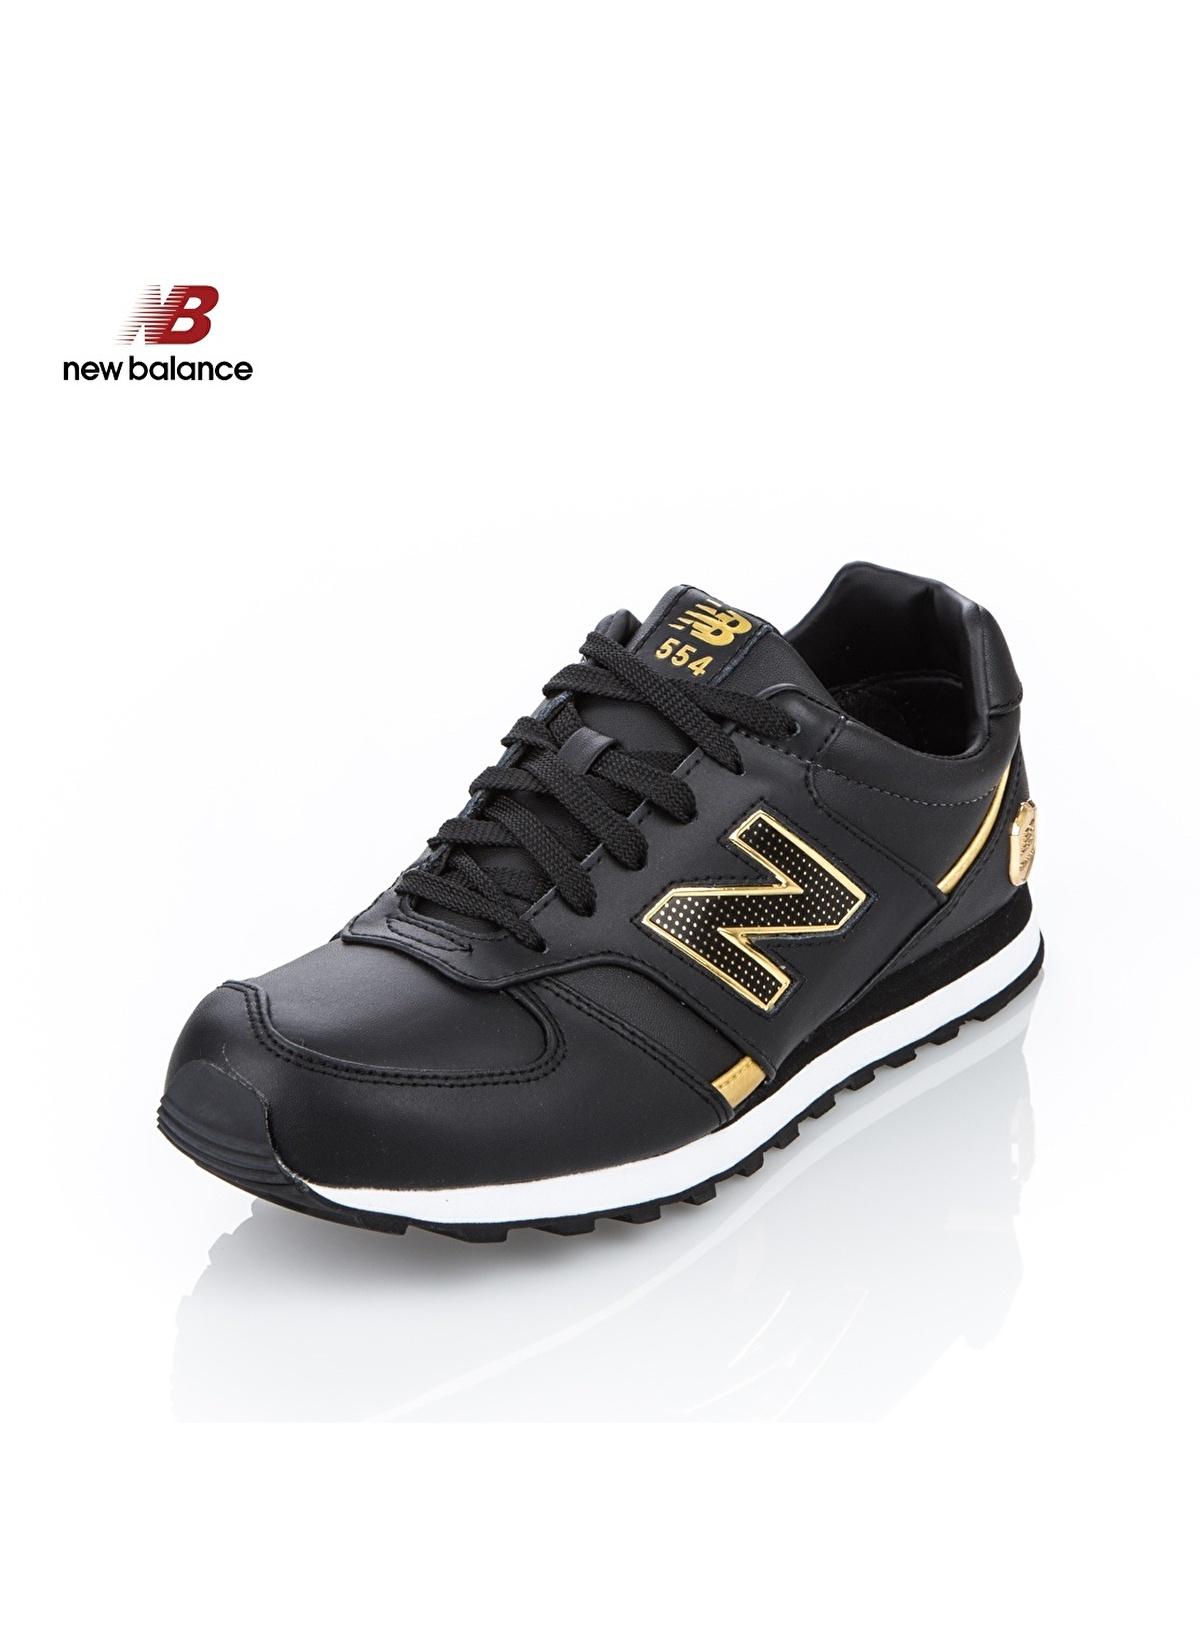 new balance hombre 554